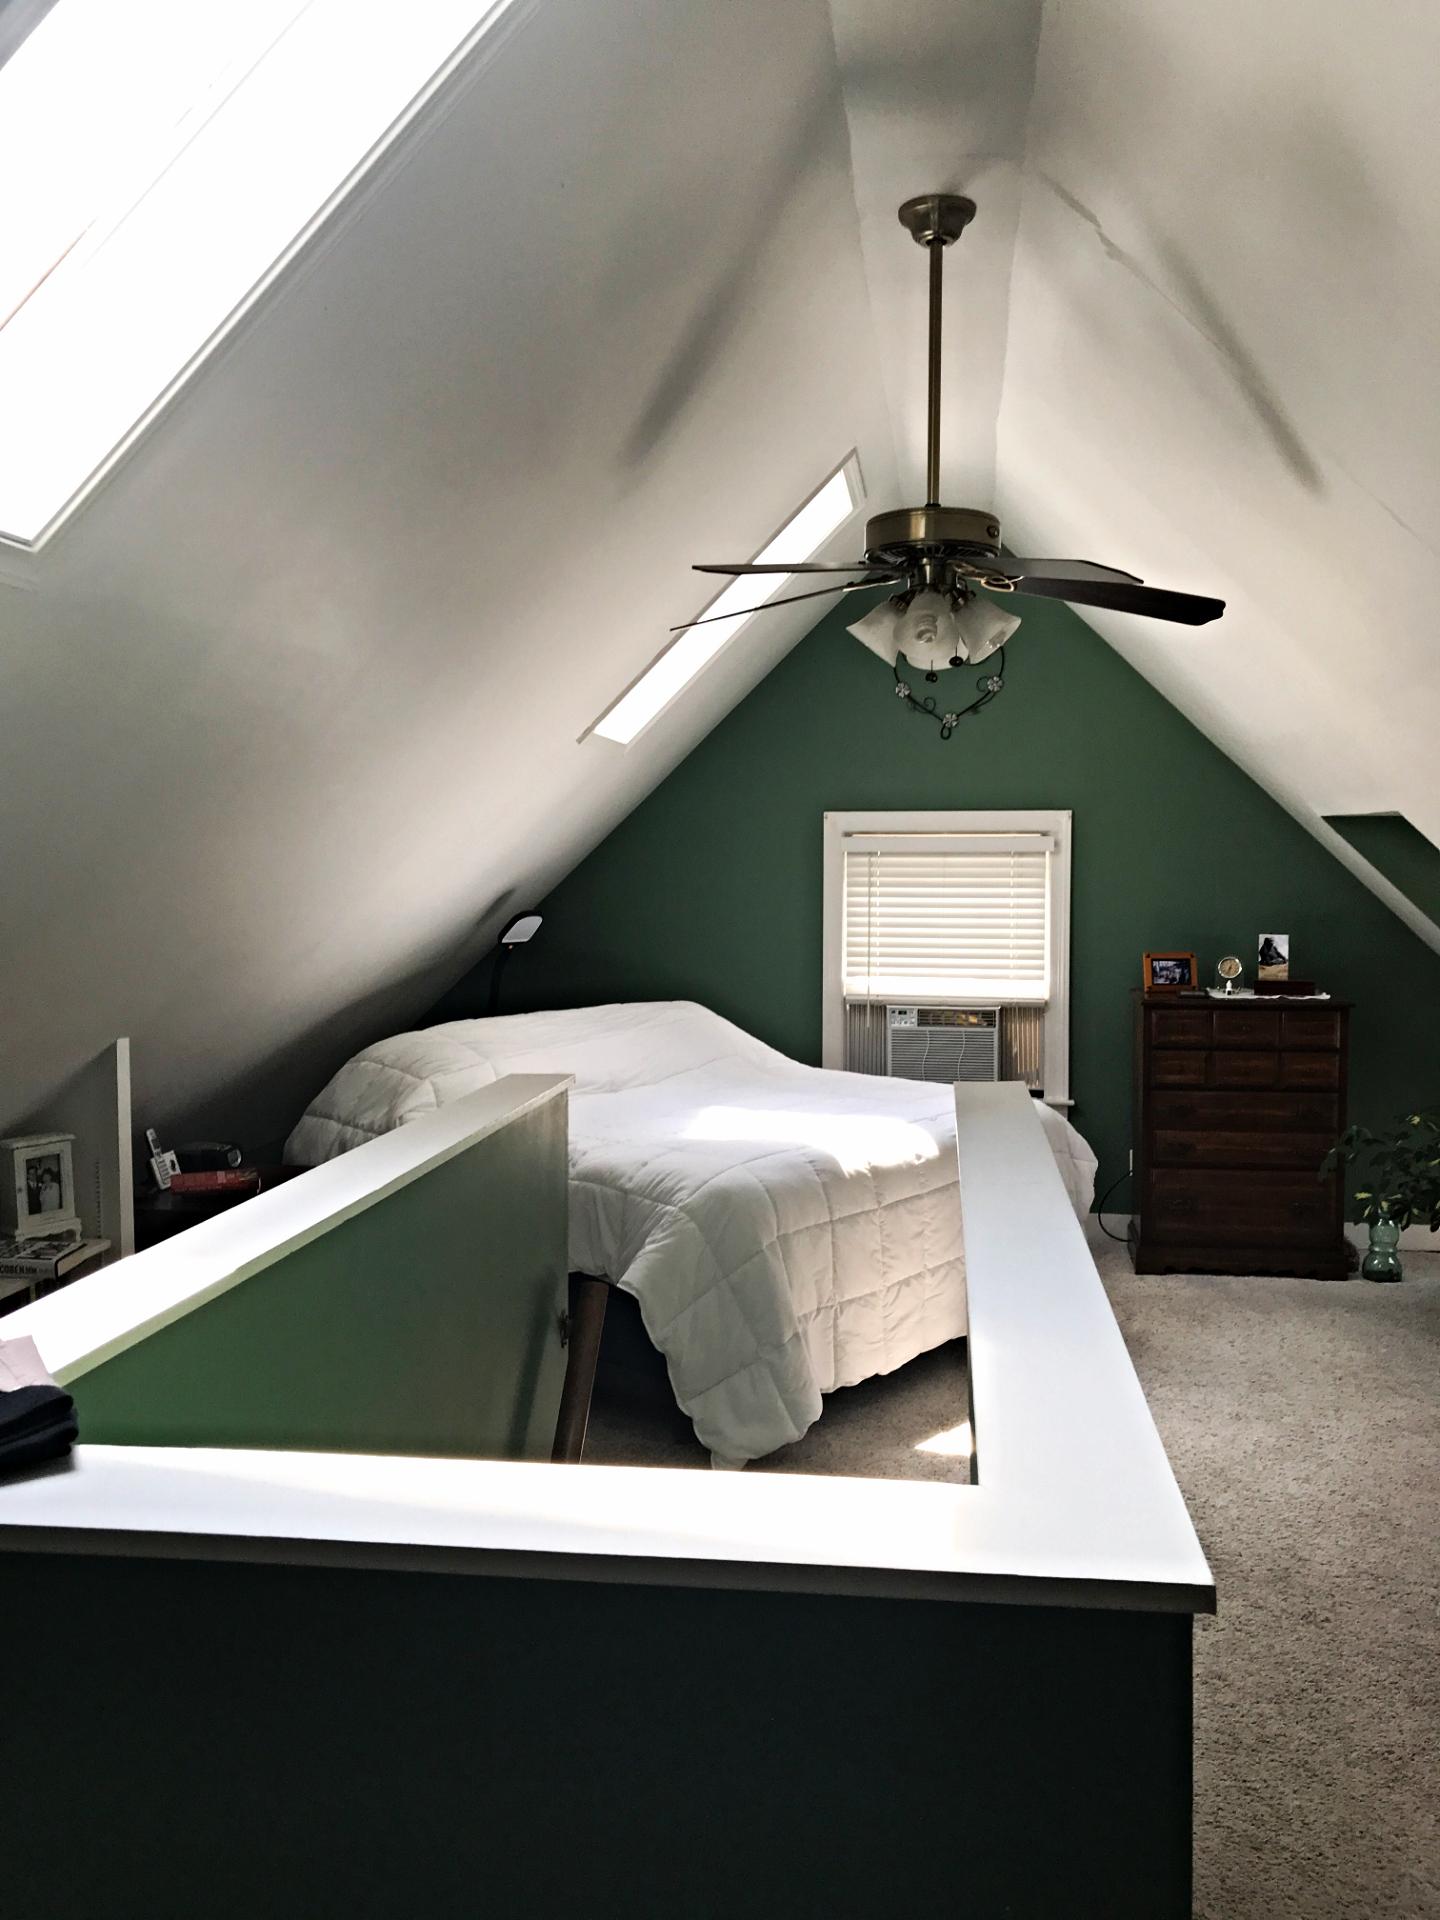 Drywall Repair & Paint (Before)